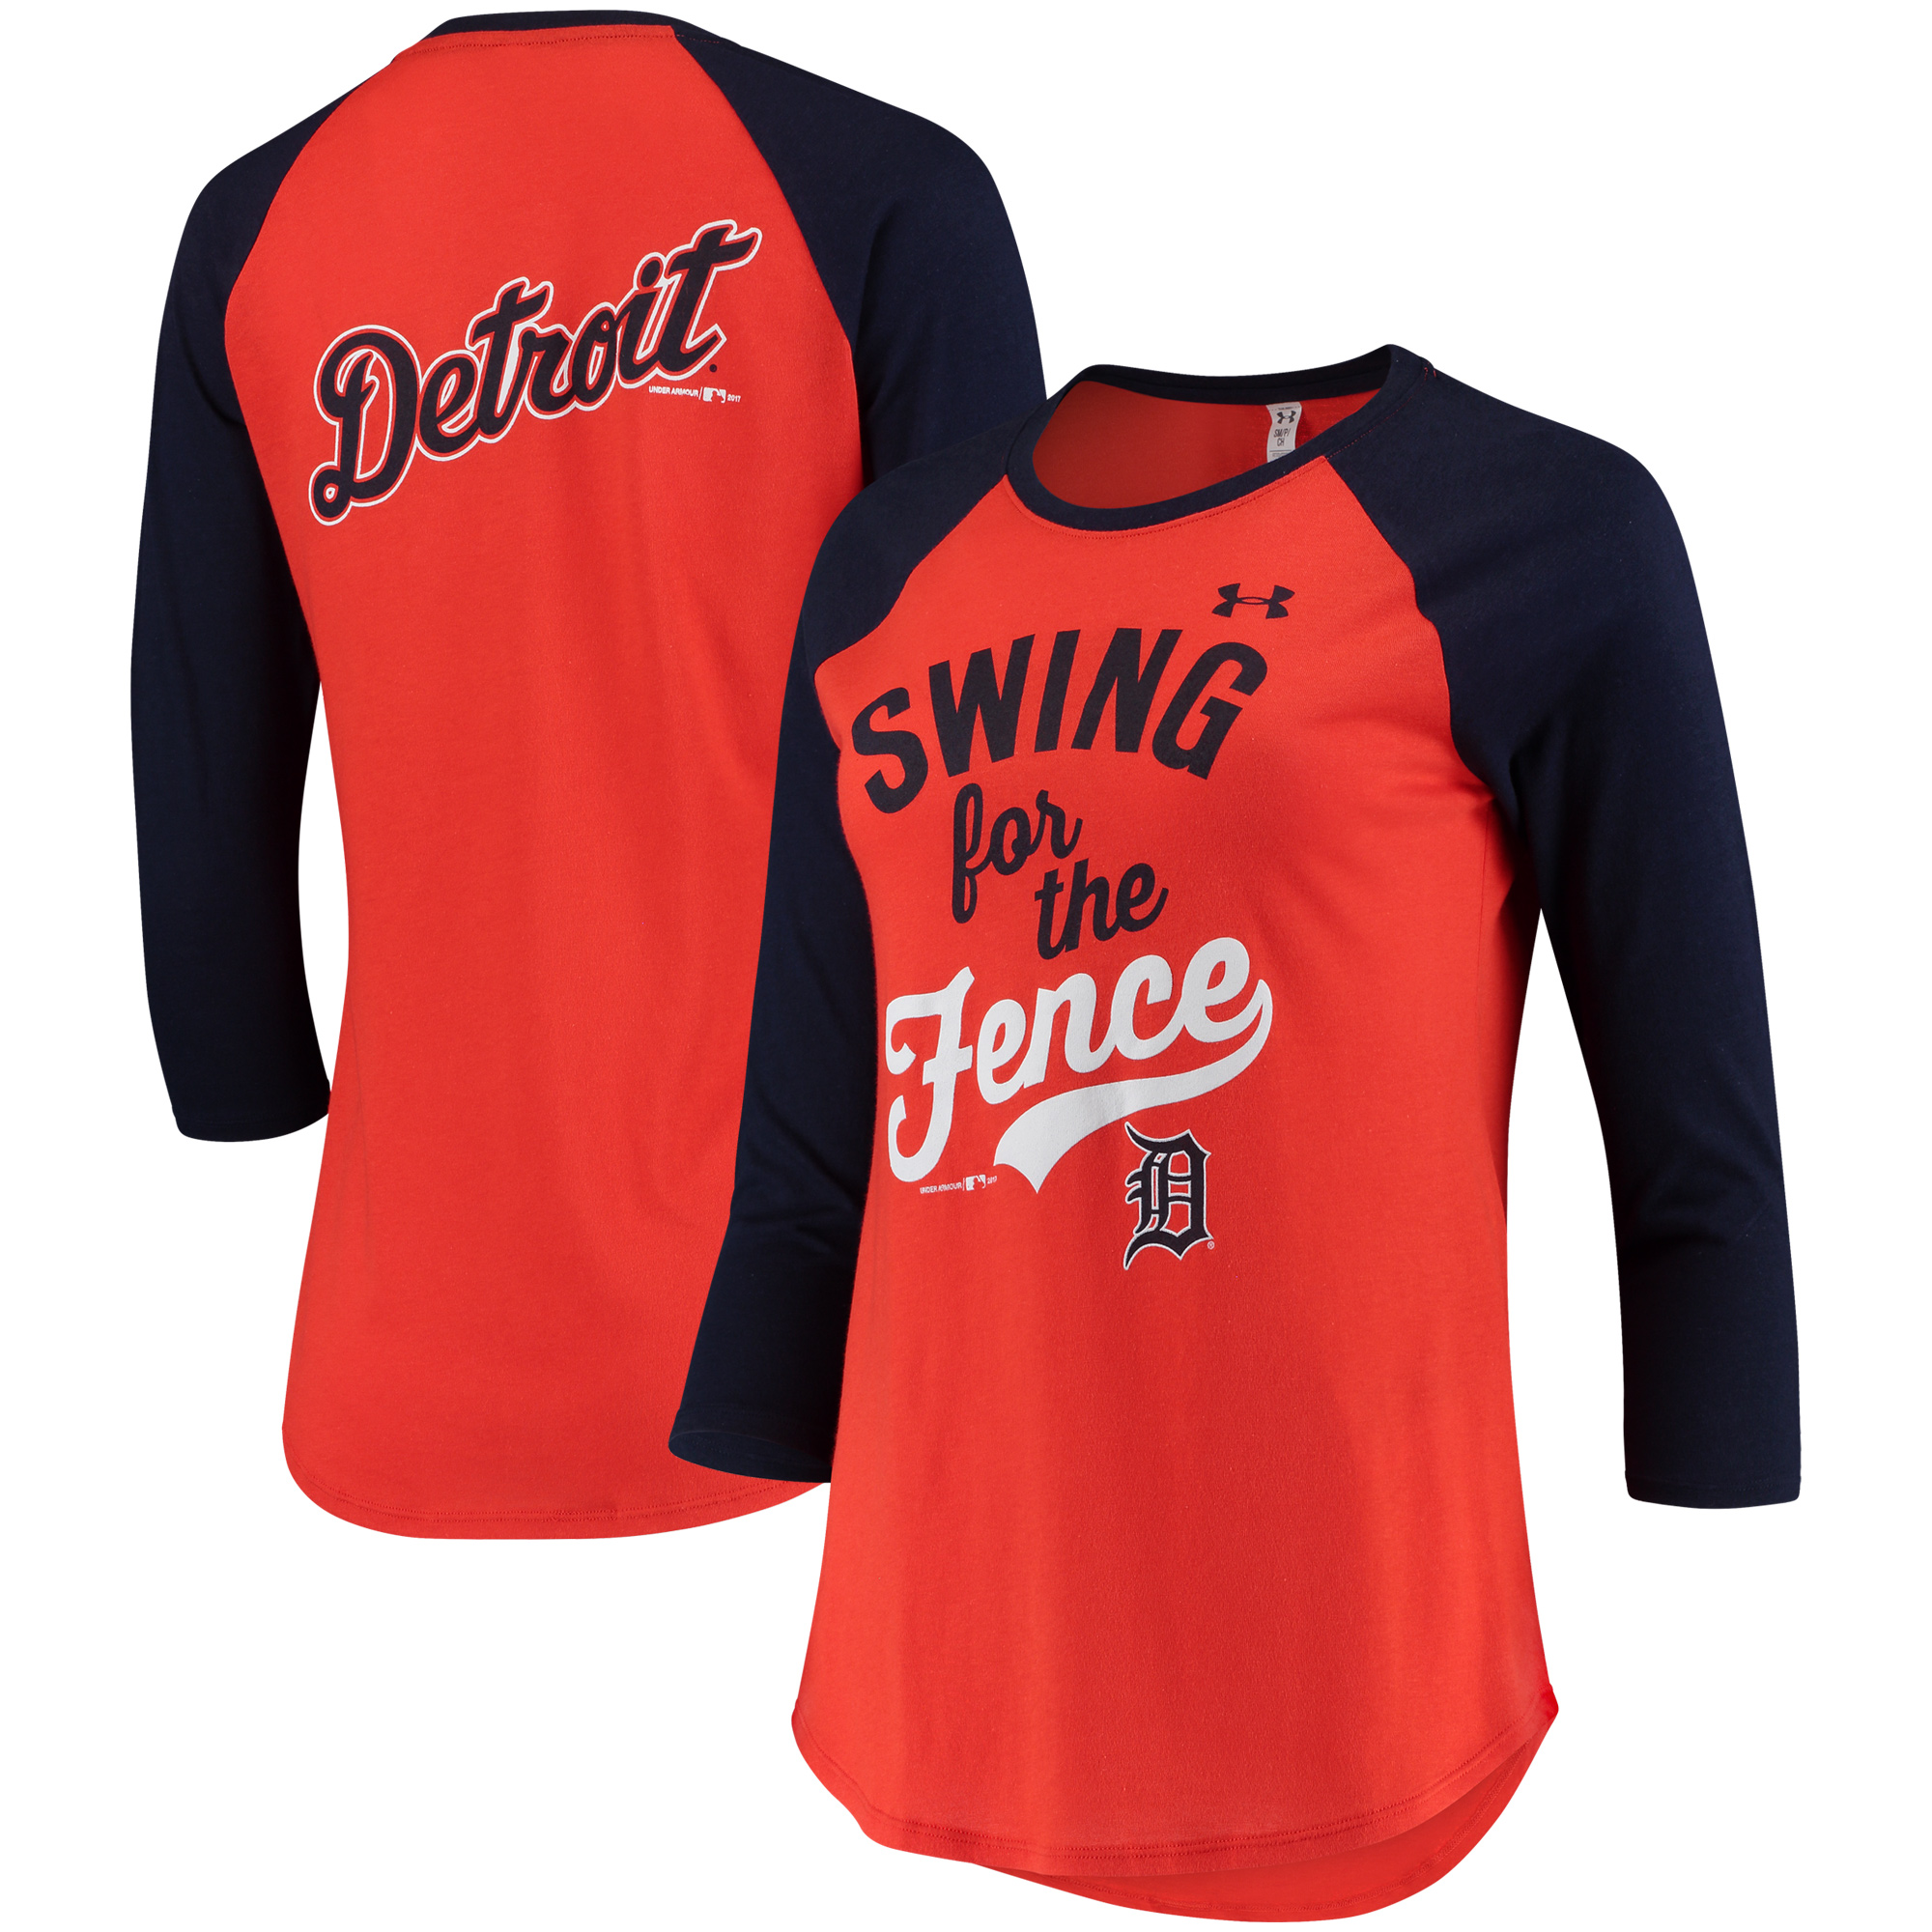 Detroit Tigers Under Armour Women's Baseball 3/4-Sleeve T-Shirt - Orange